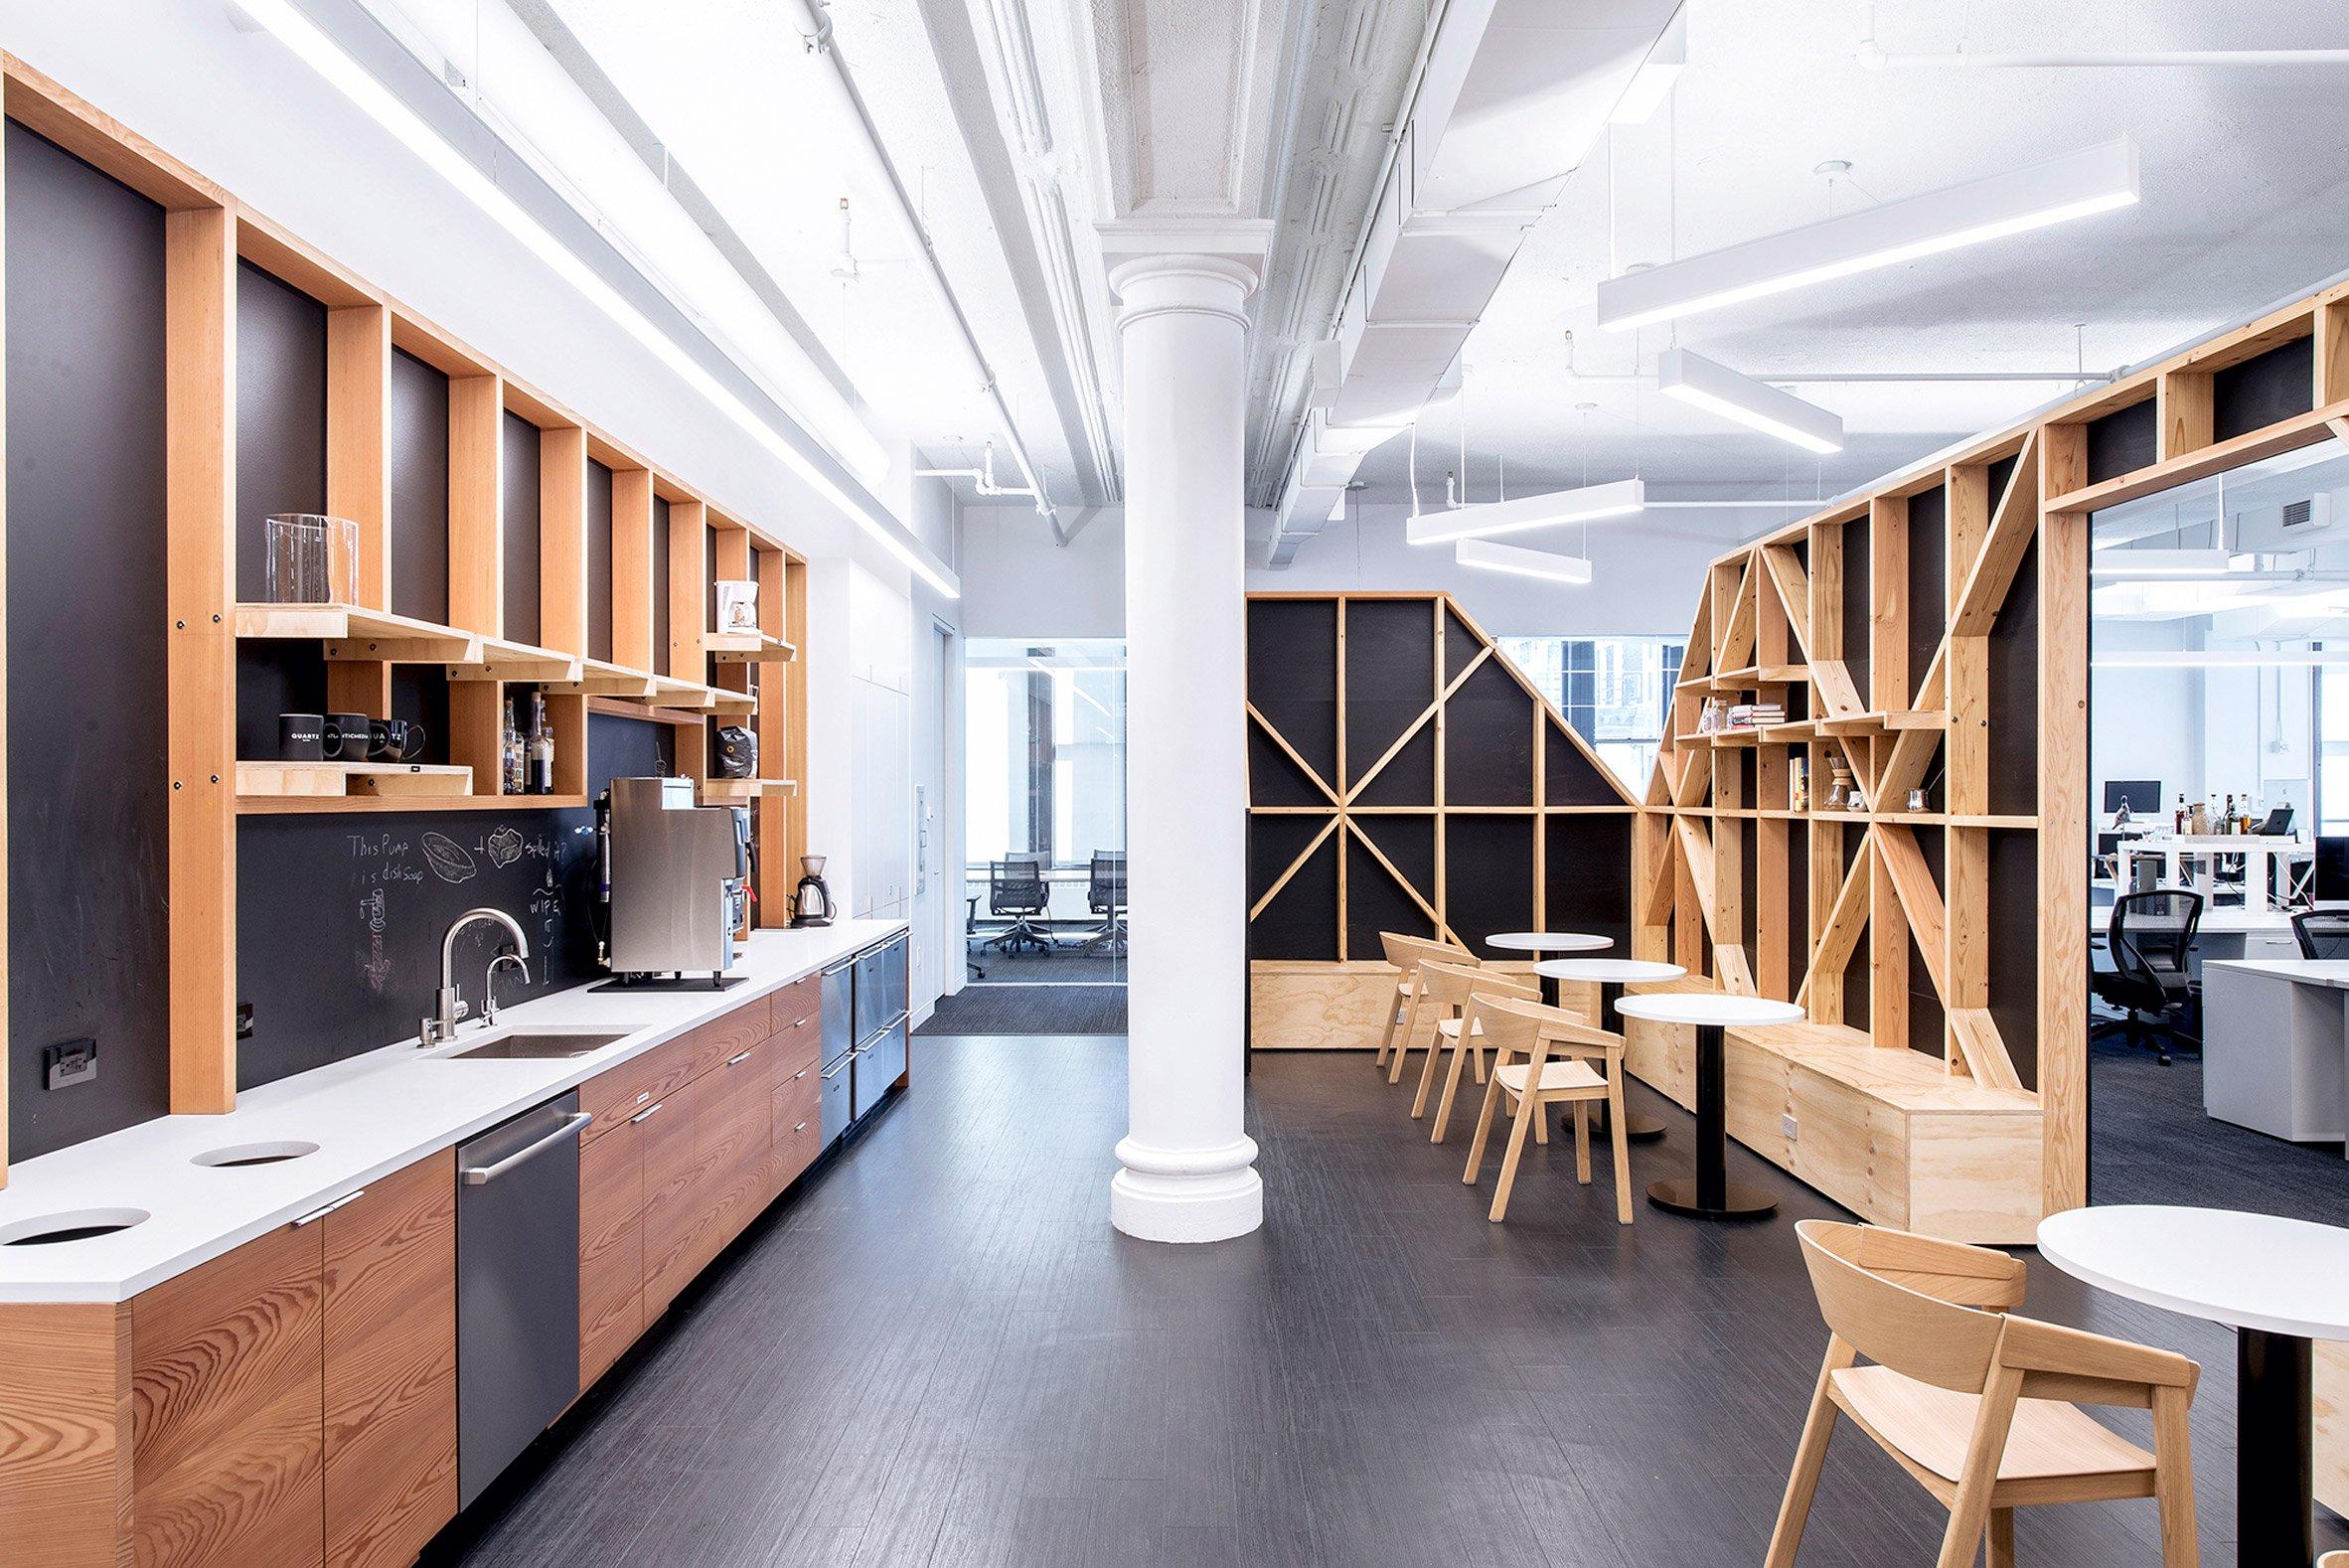 architecture-interiors-offices- manhatten-new-york-design-studia-osnovadesign-osnova-poltava_06